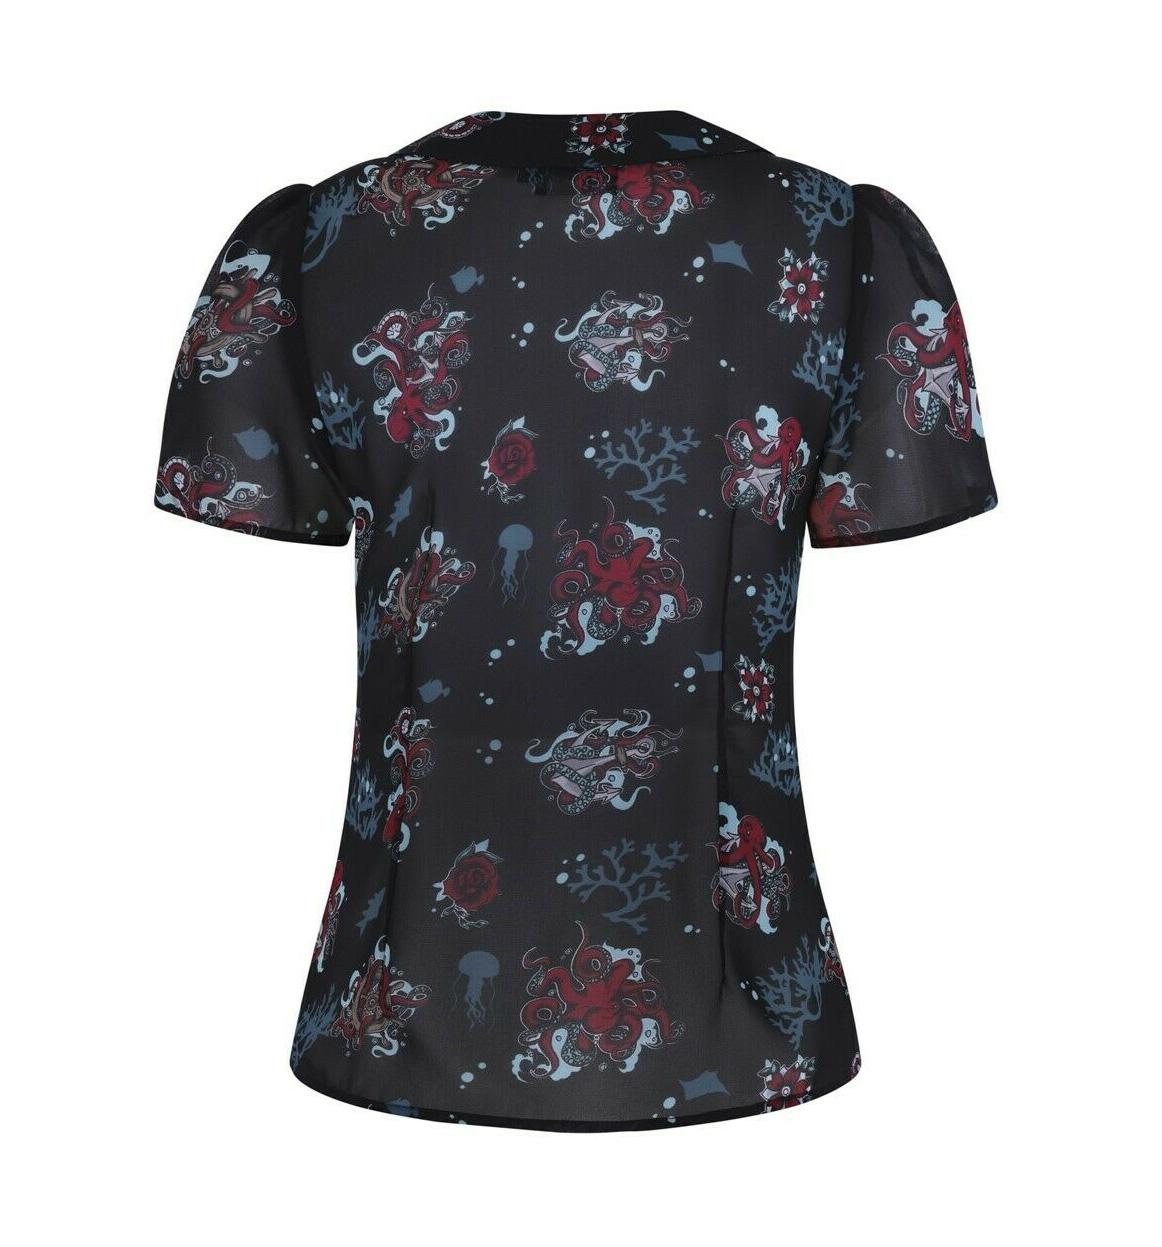 Hell-Bunny-50s-Shirt-Top-Black-Ocean-Octopus-Roses-POSEIDON-Blouse-All-Sizes thumbnail 31